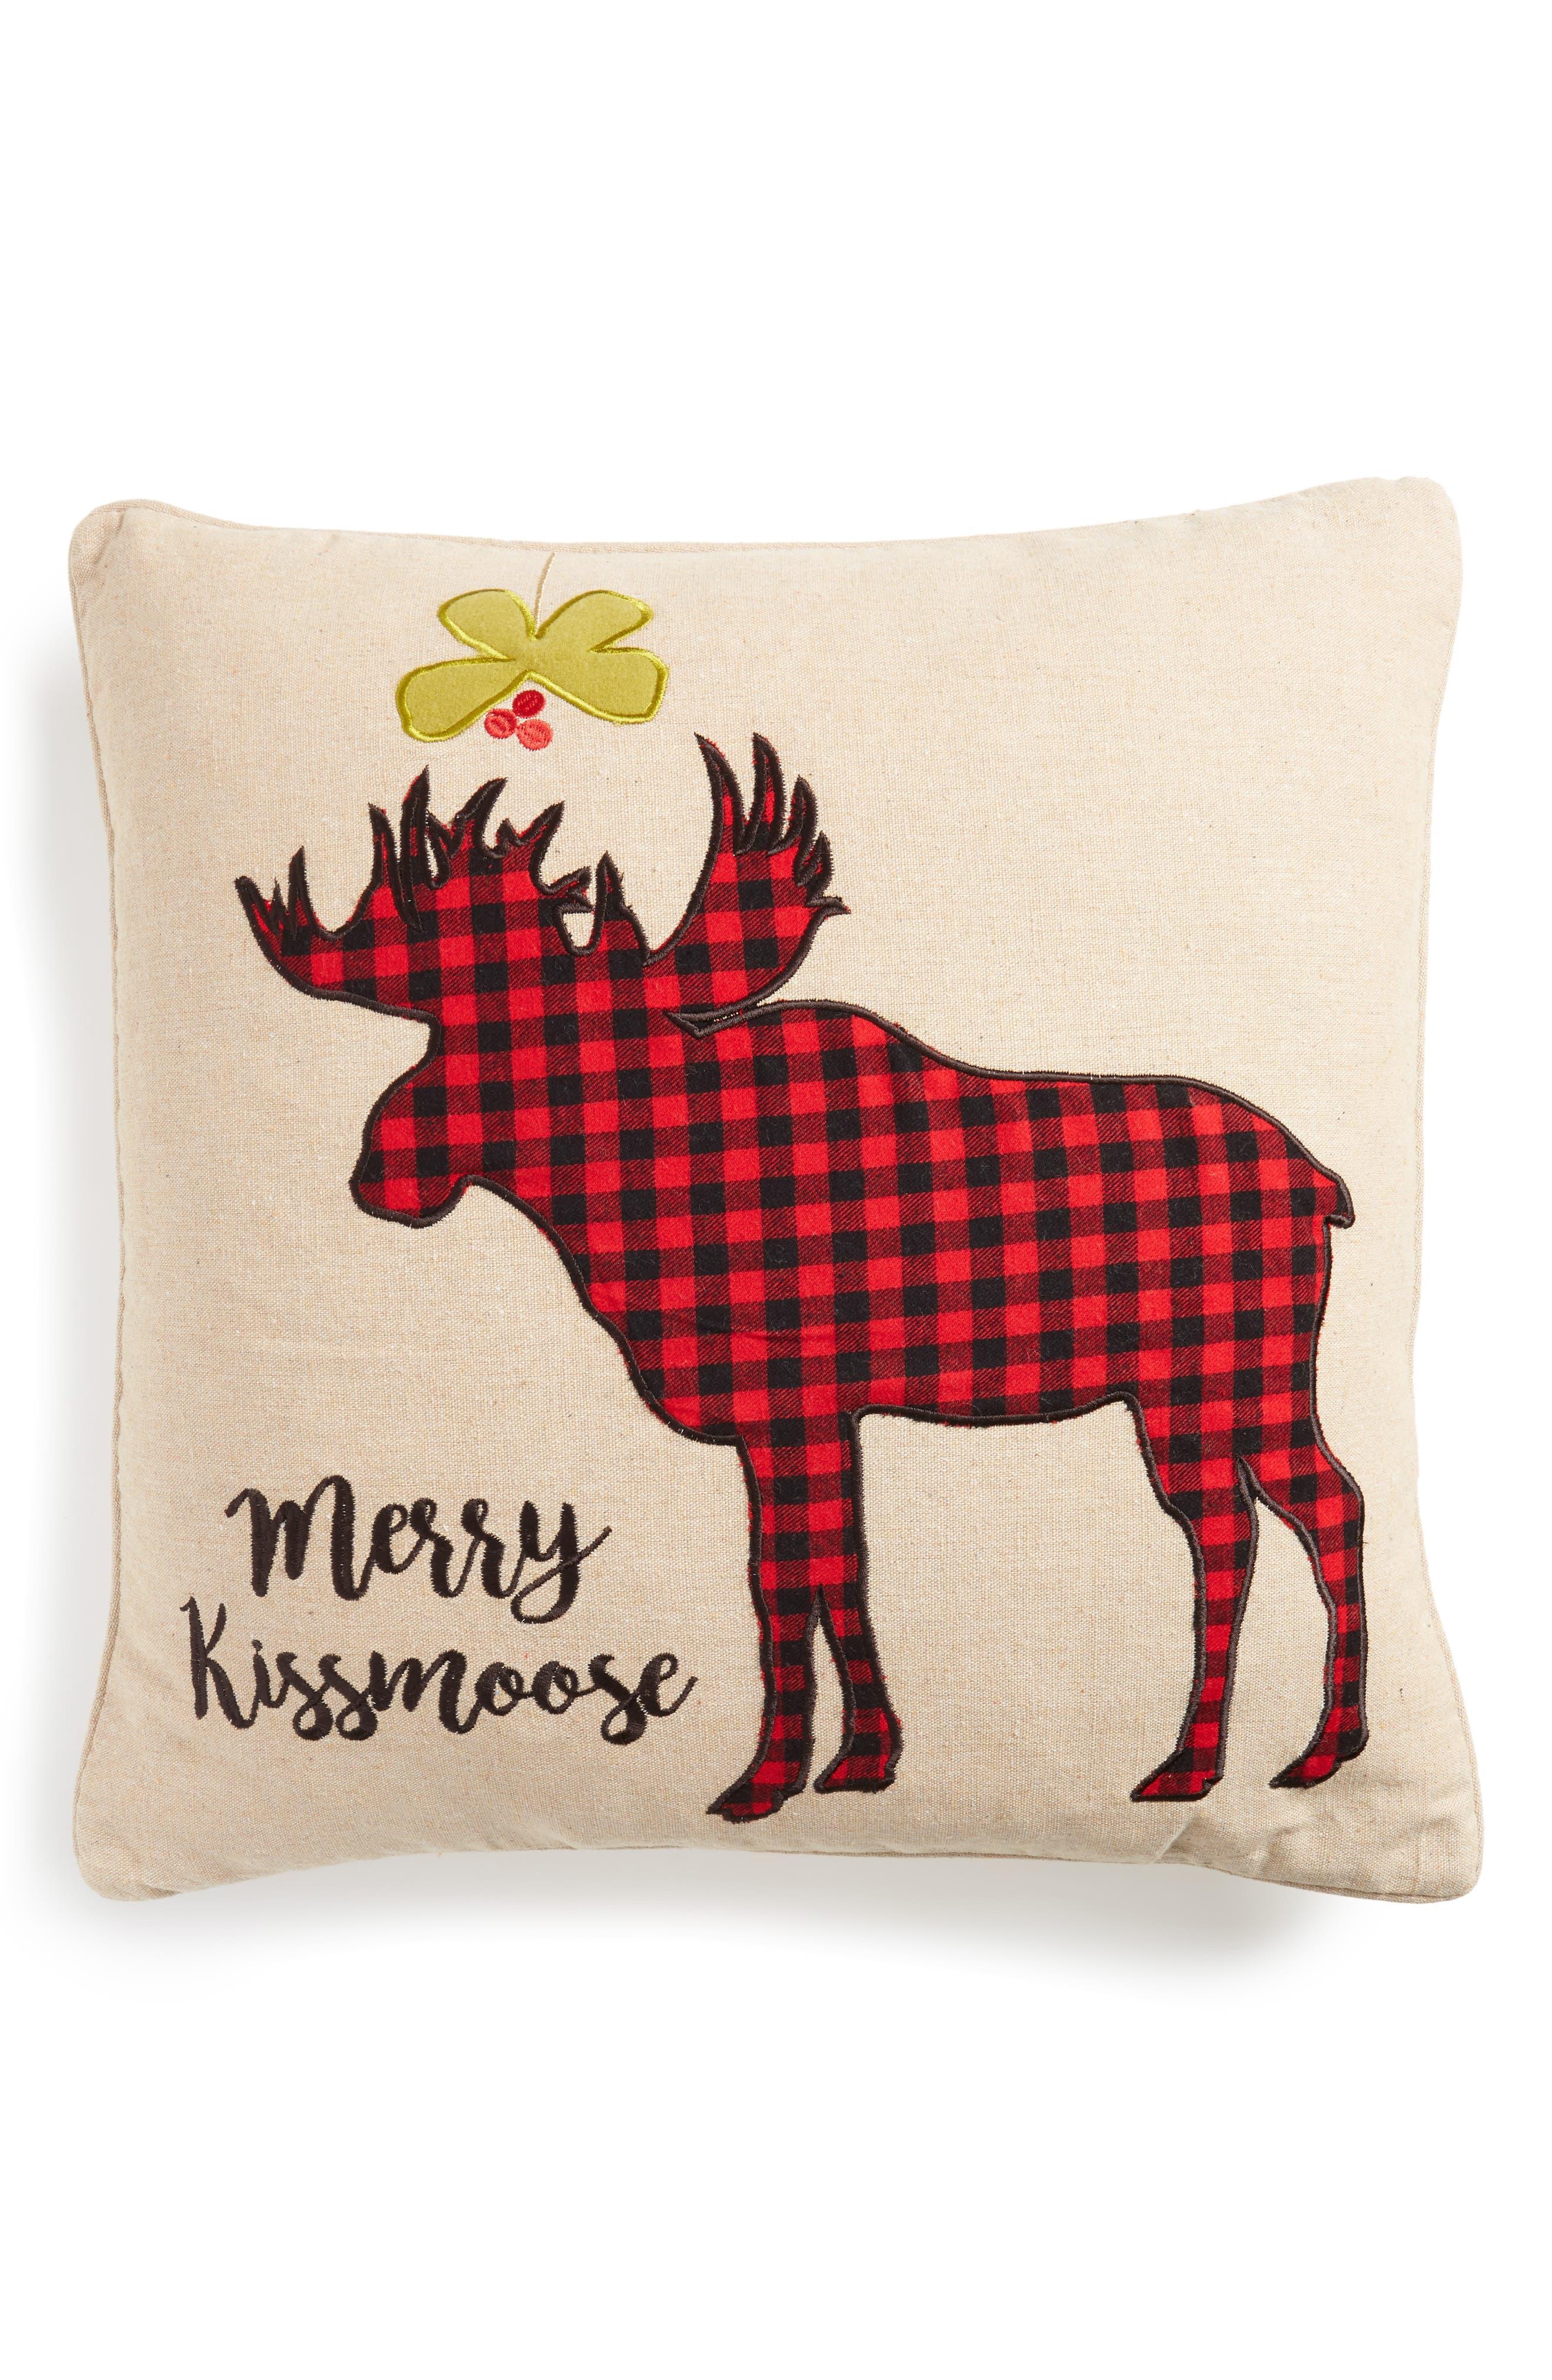 Plaid Merry Kissmoose Accent Pillow,                             Main thumbnail 1, color,                             900